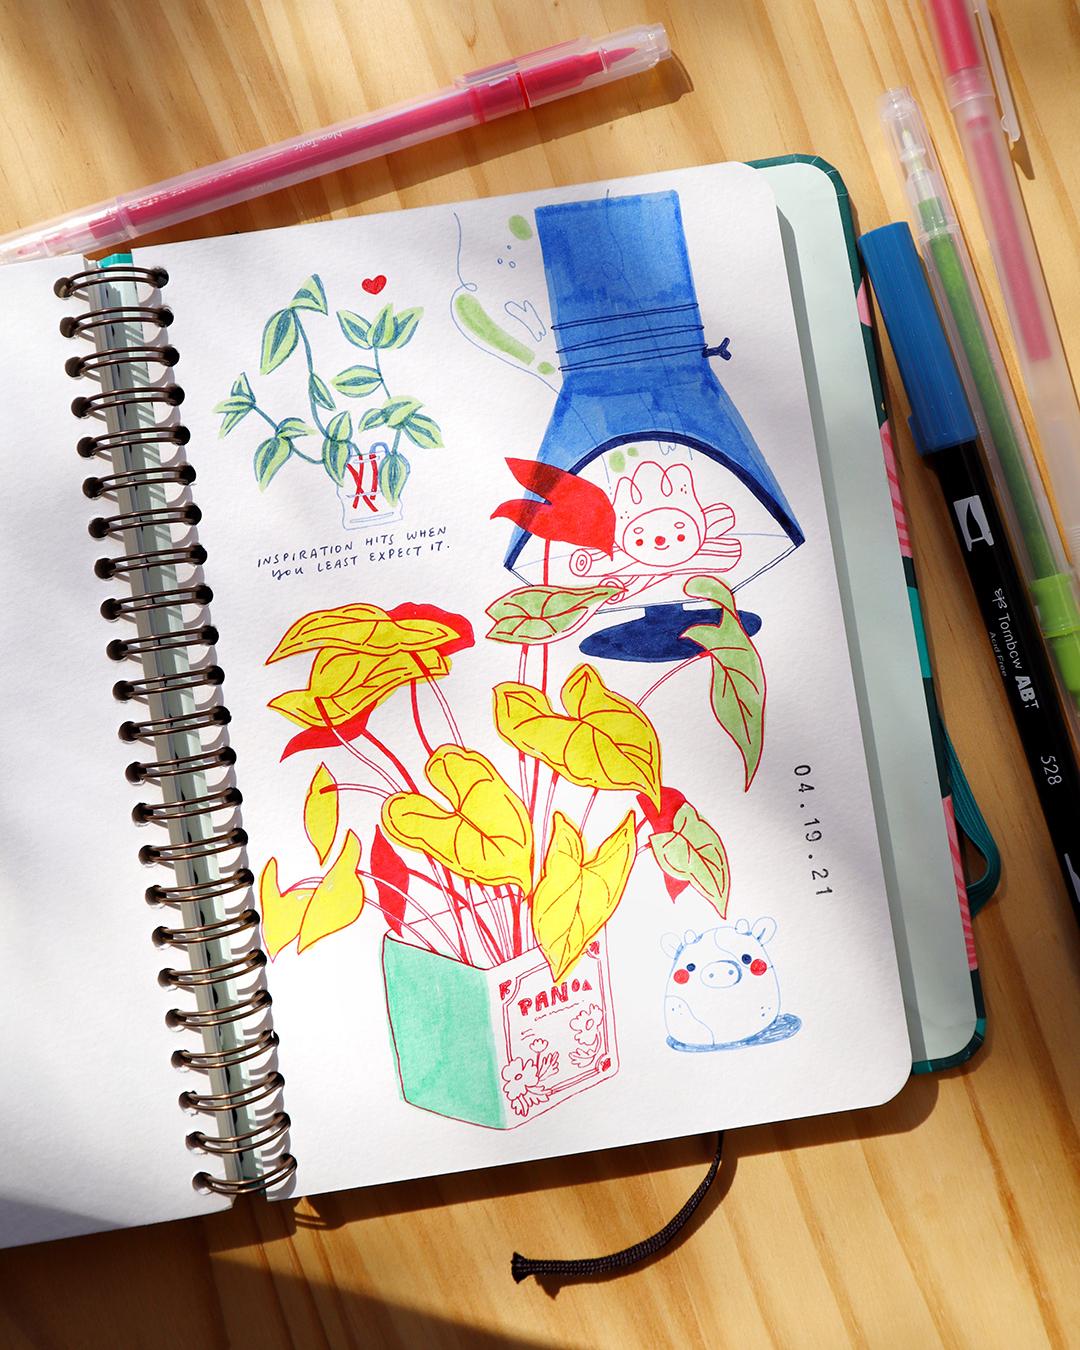 GirlsclubAsia-Artist-Tiffany Tan-2